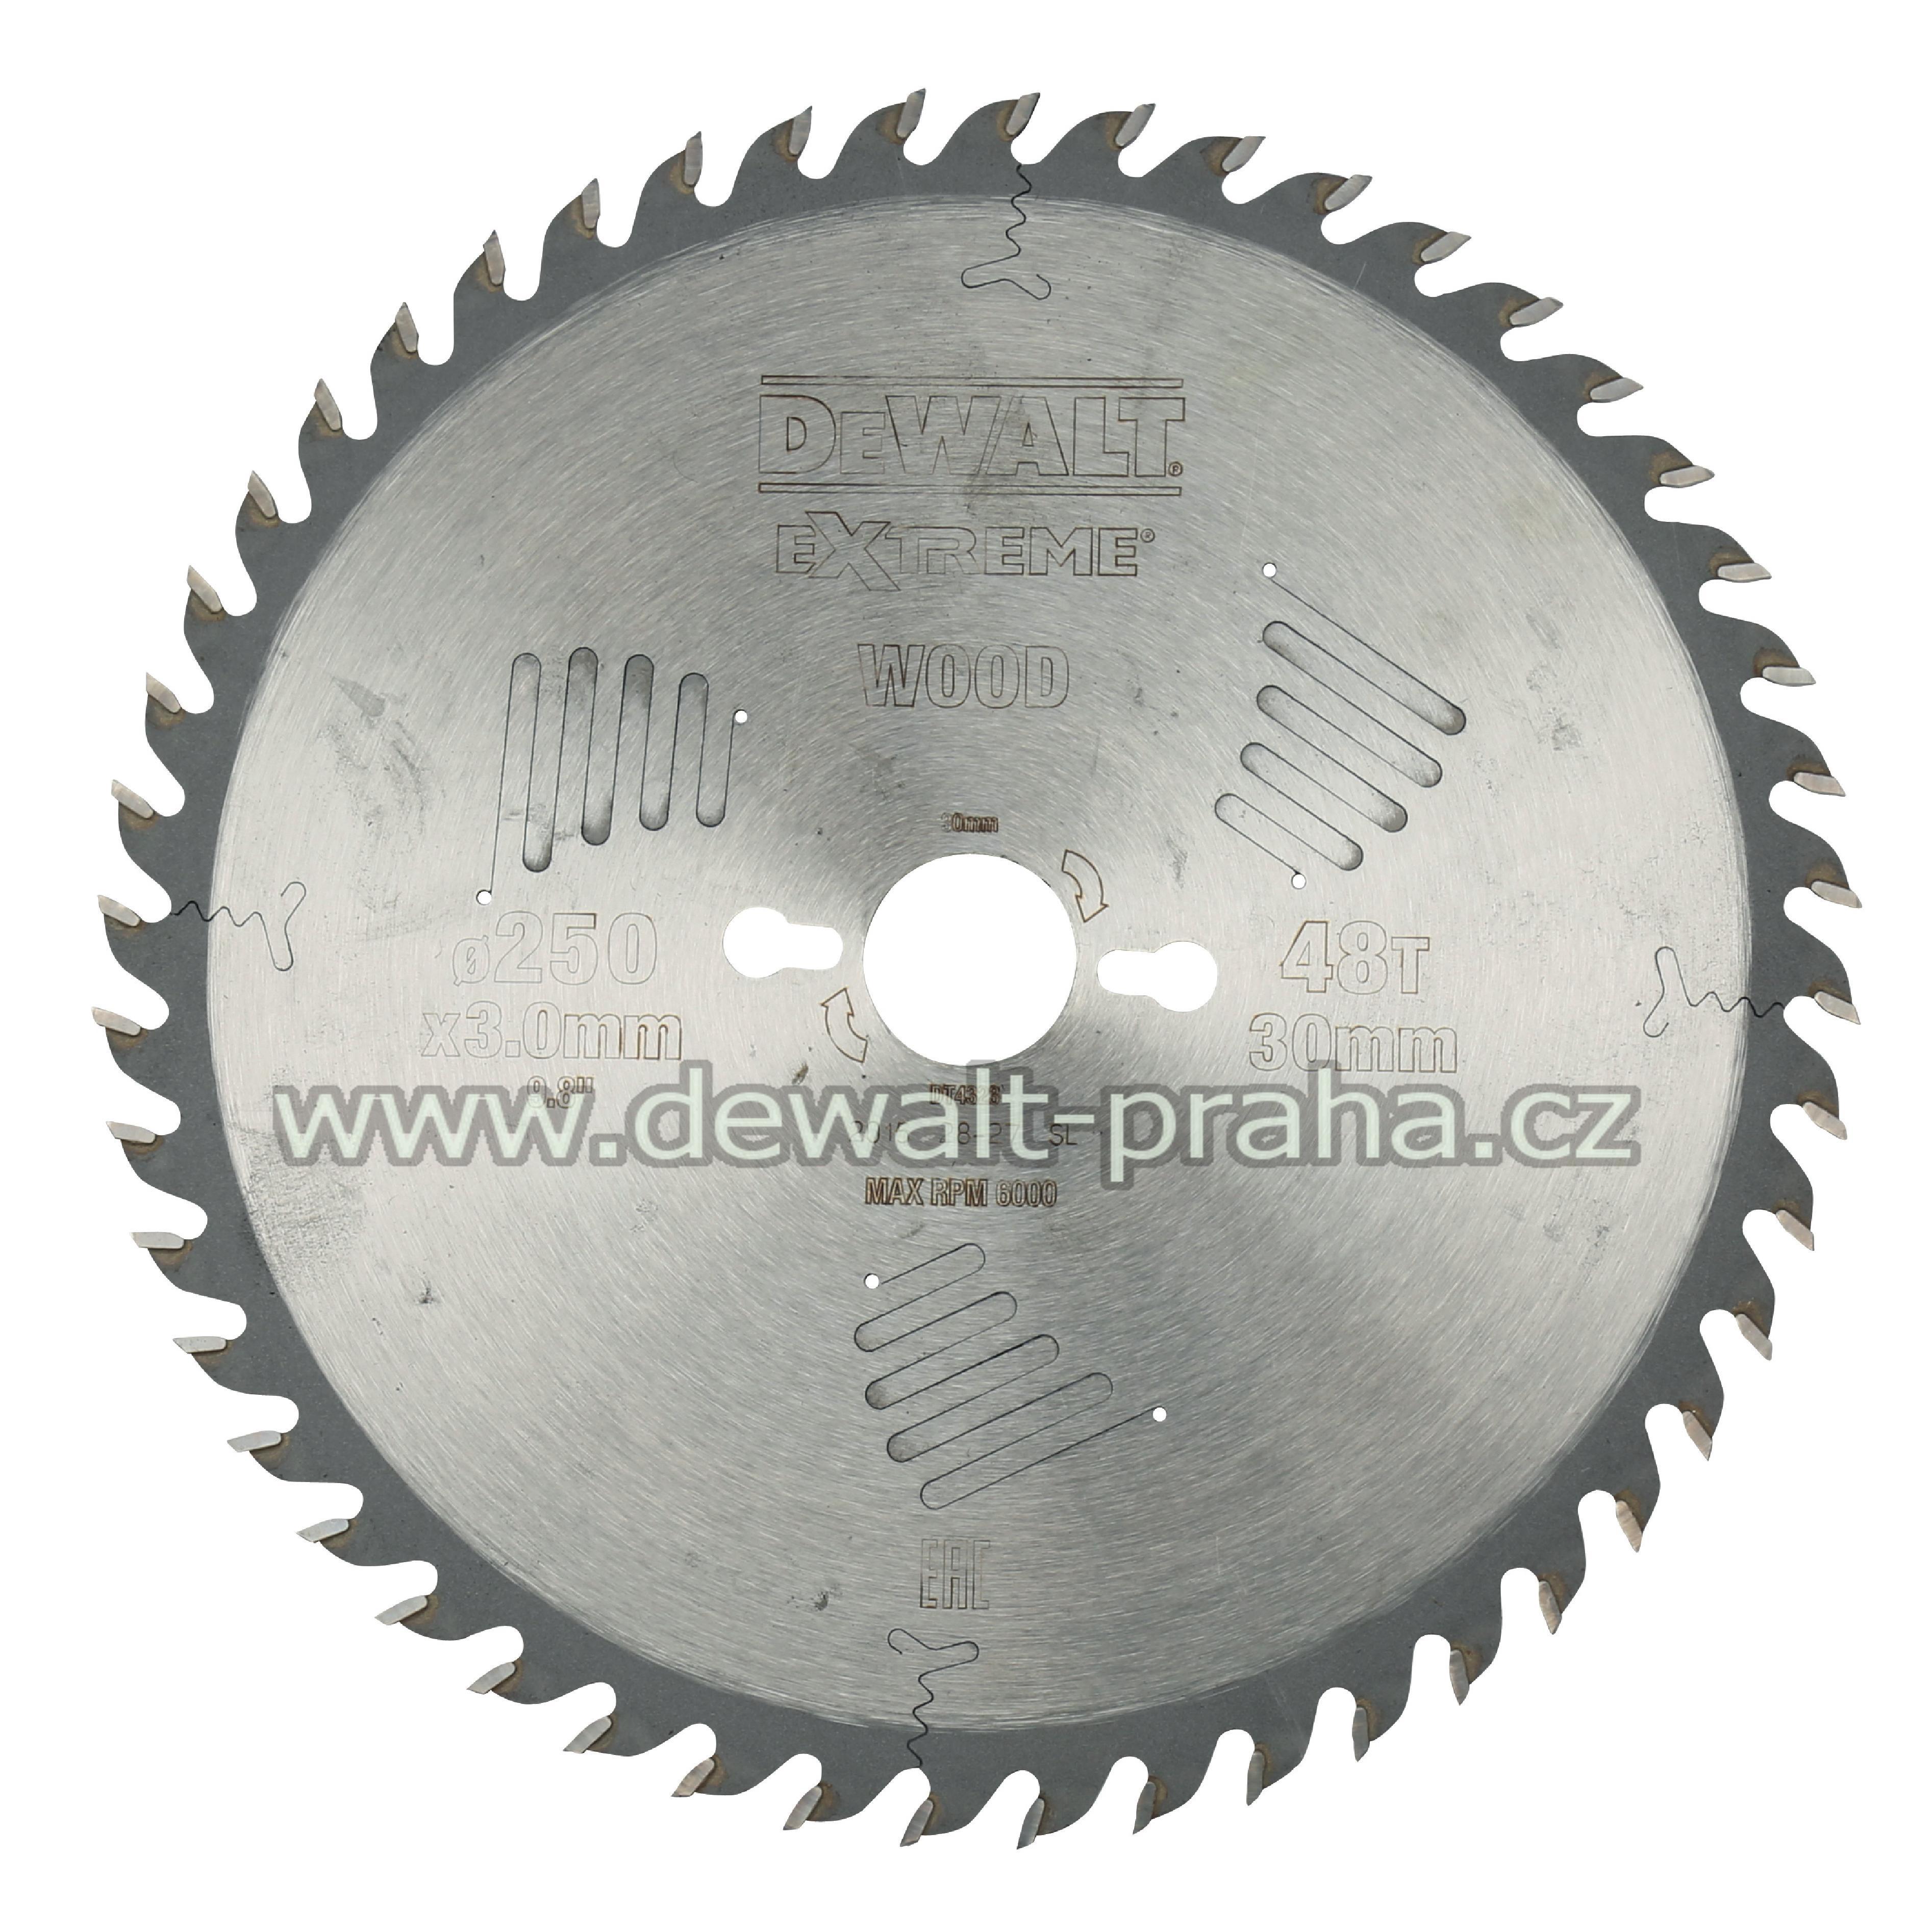 DT4323 DeWALT Pilový kotouč 250x30mm, 30 zubů